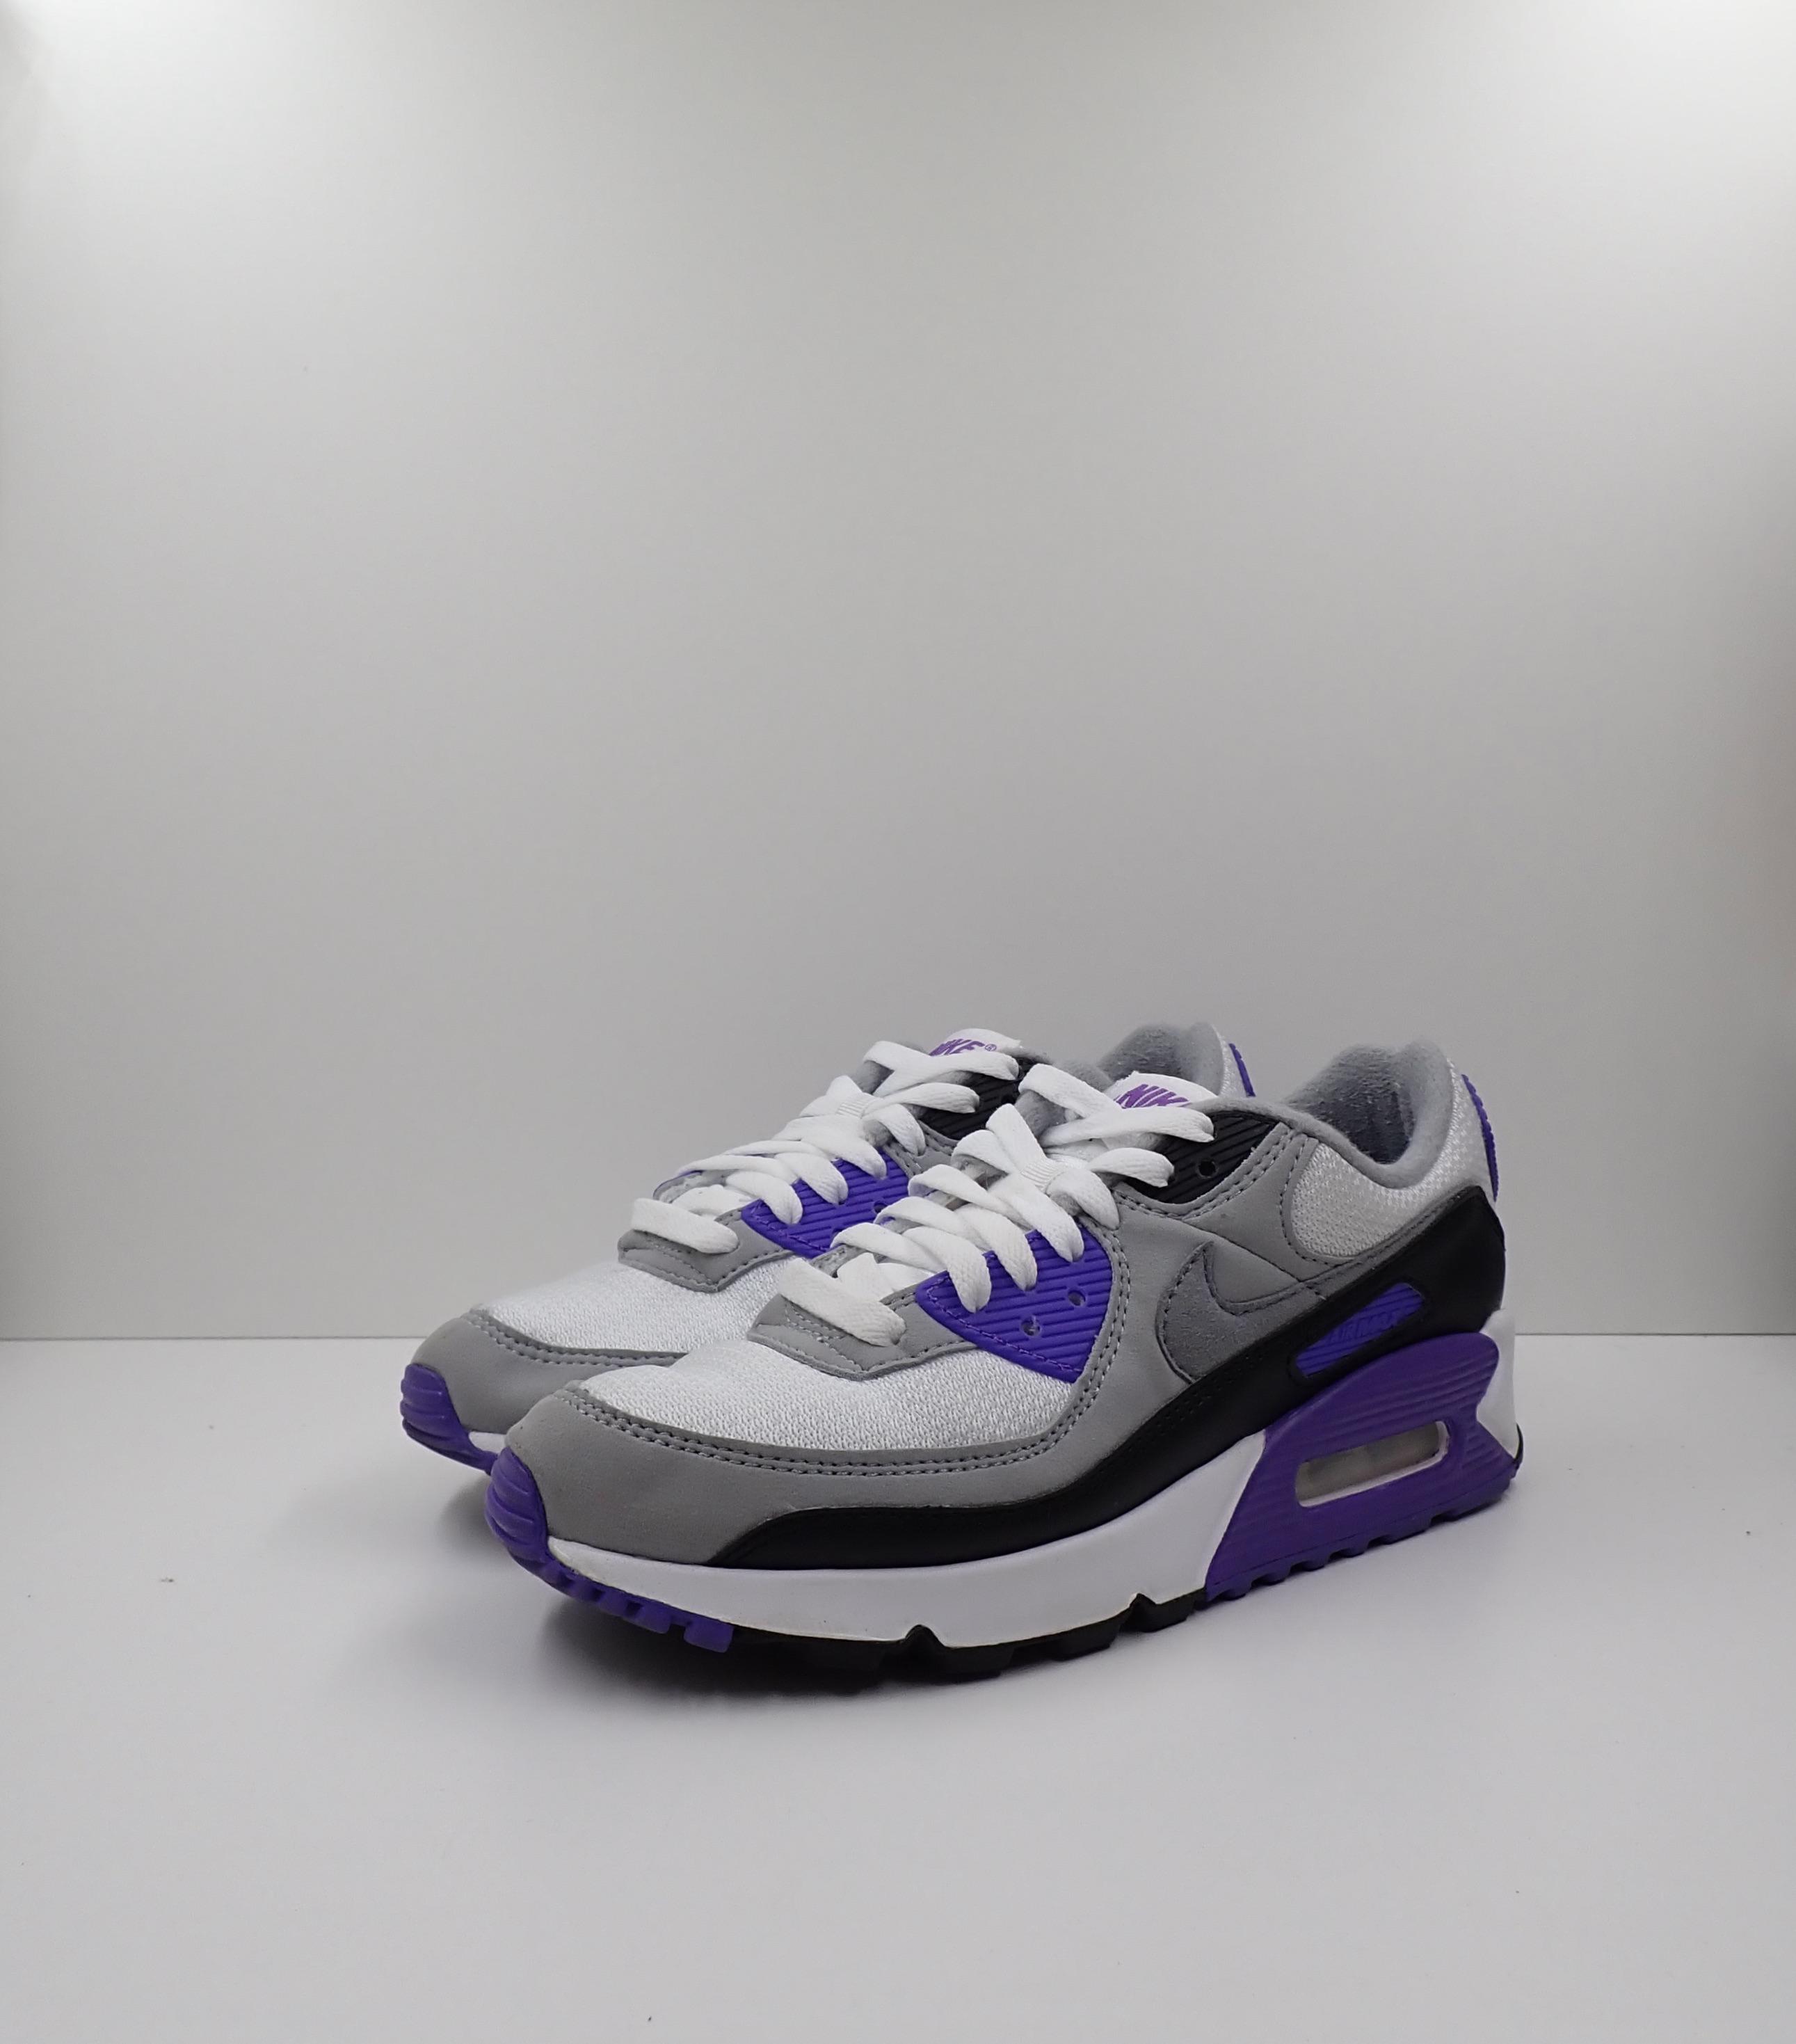 Nike Air Max 90 Recraft Hyper Grape